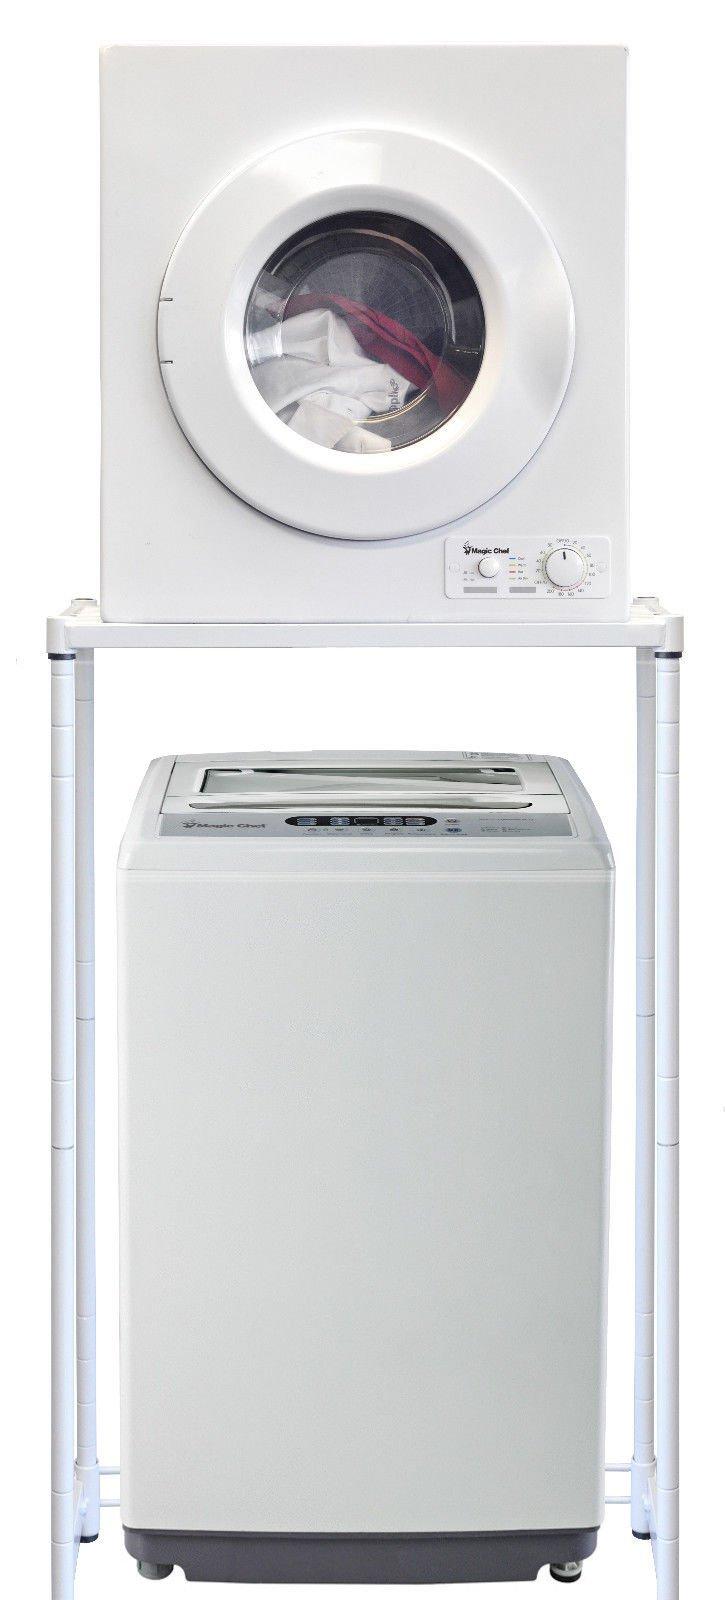 Magic Chef Compact Portable 1.6 cu ft. Top Load Washing Machine Bundle with 2.6 cu ft Front Load Dryer COMBO/SET - 120 Volts, Indoor-Safe + BONUS Indoor Lint Trap Kit